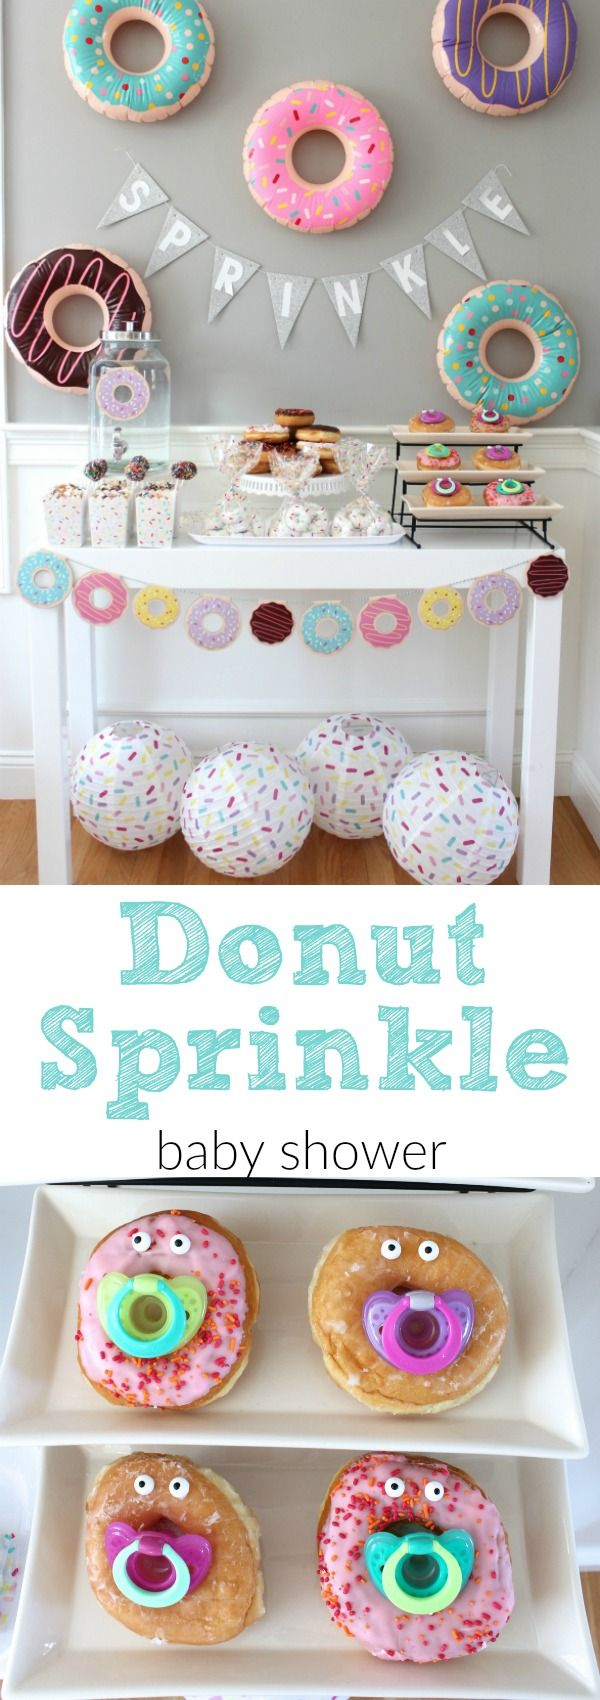 Best 25+ Baby shower themes ideas on Pinterest